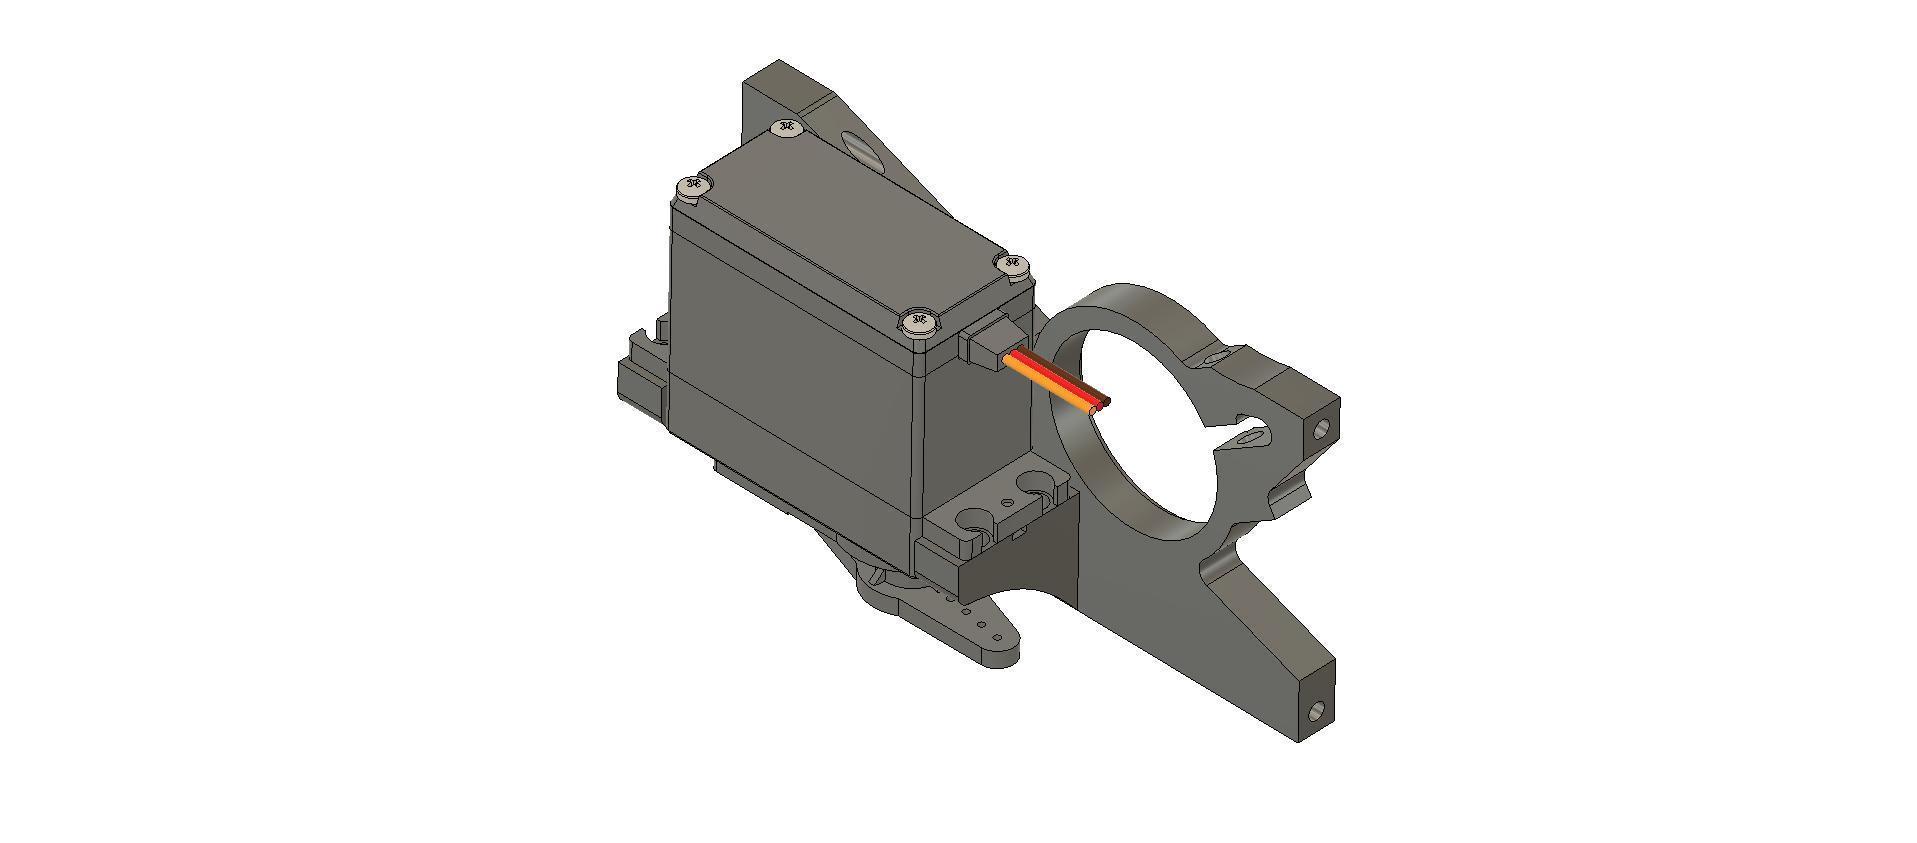 AR320261 ARAC3468 BULKHEAD MID-FRONT v12 with servo.jpg Download STL file ARRMA NERO / FAZON AR320261 ARAC3468 BULKHEAD MID-FRONT with custom servo mount • 3D printer design, peterbroeders